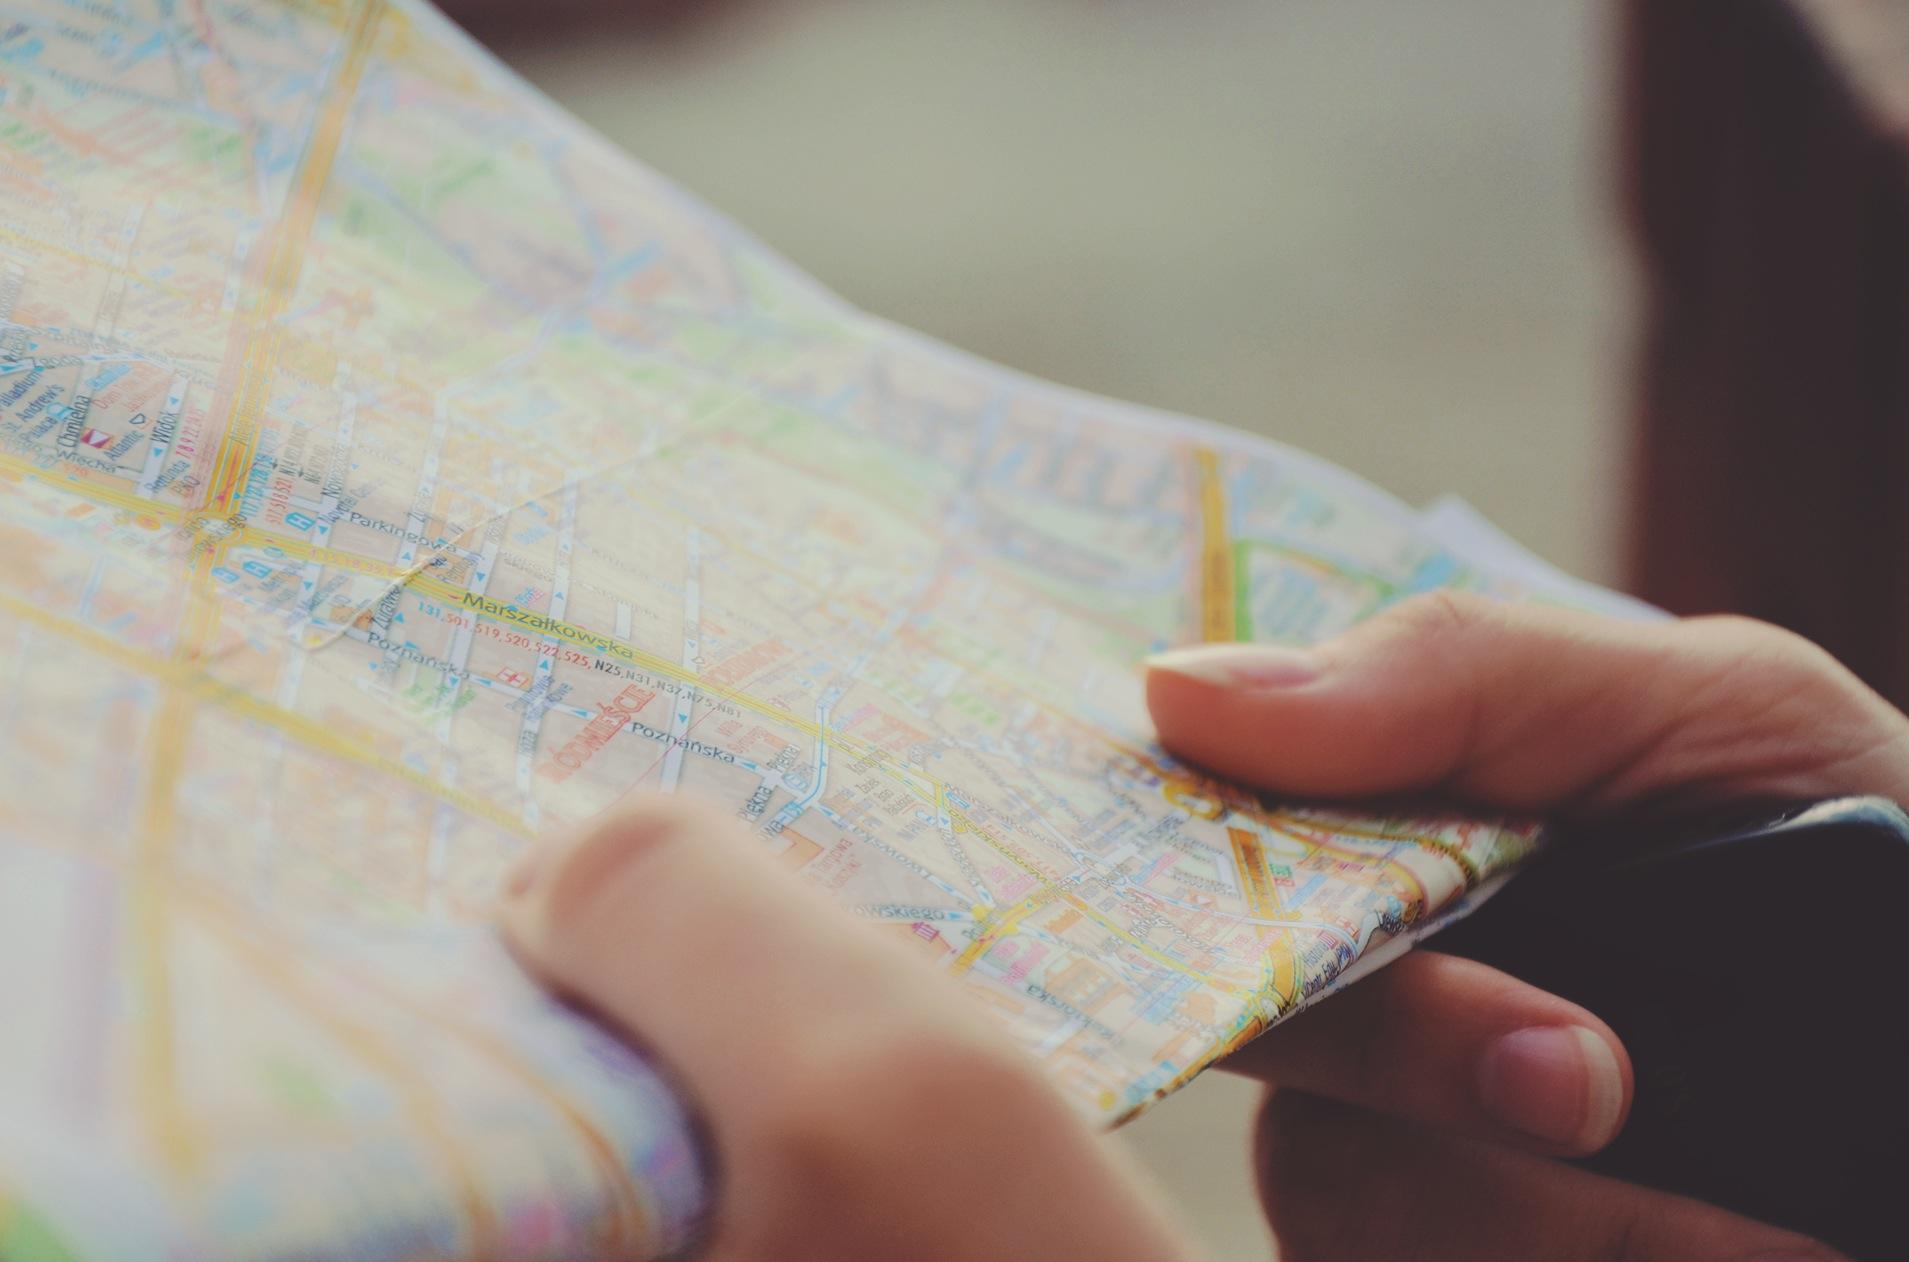 holding a map Sylwia Bartyzel.jpg